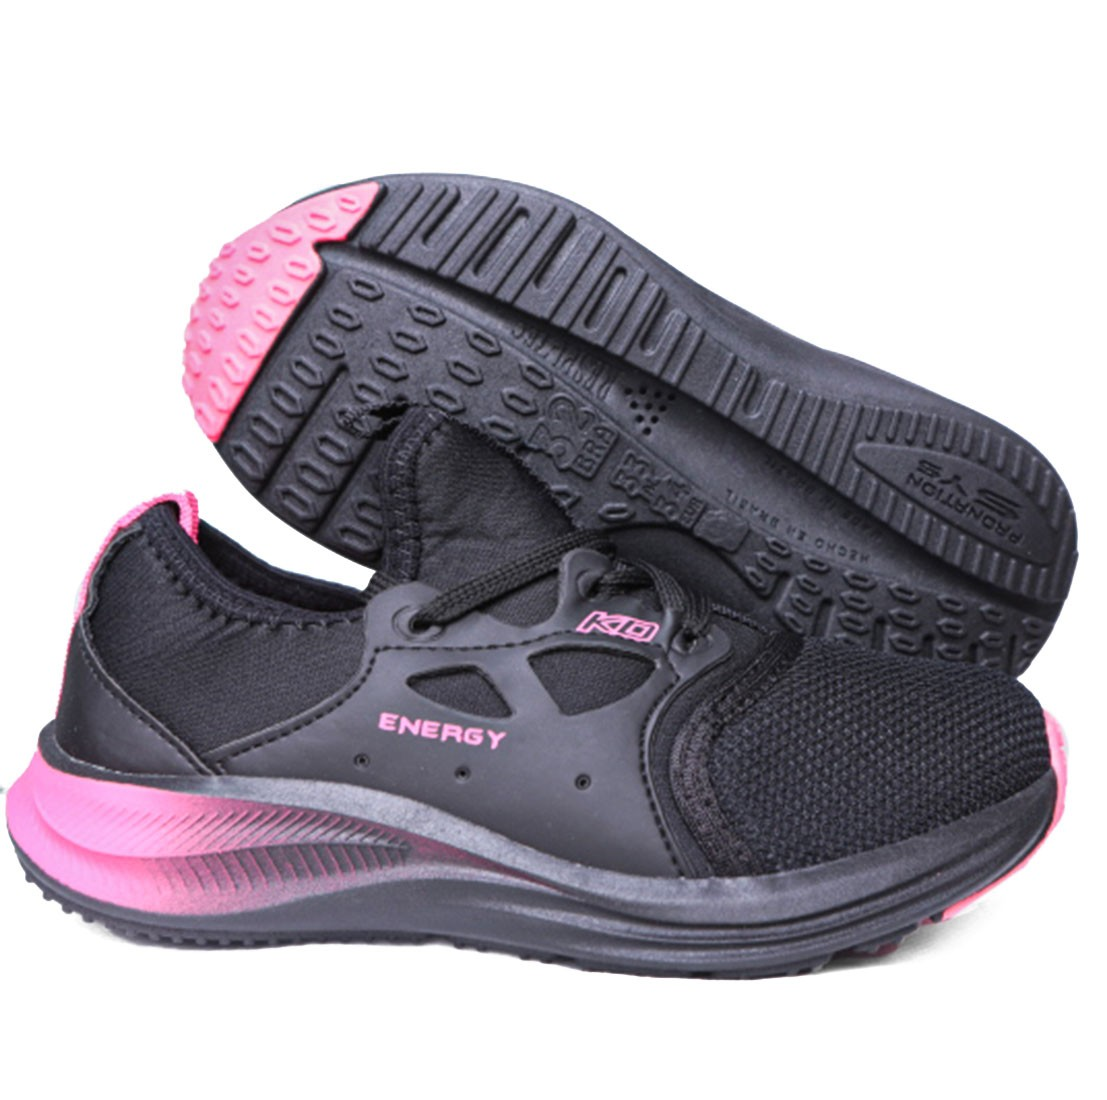 Tênis Esportivo Infantil Kidy Energy Respitec 037-0006